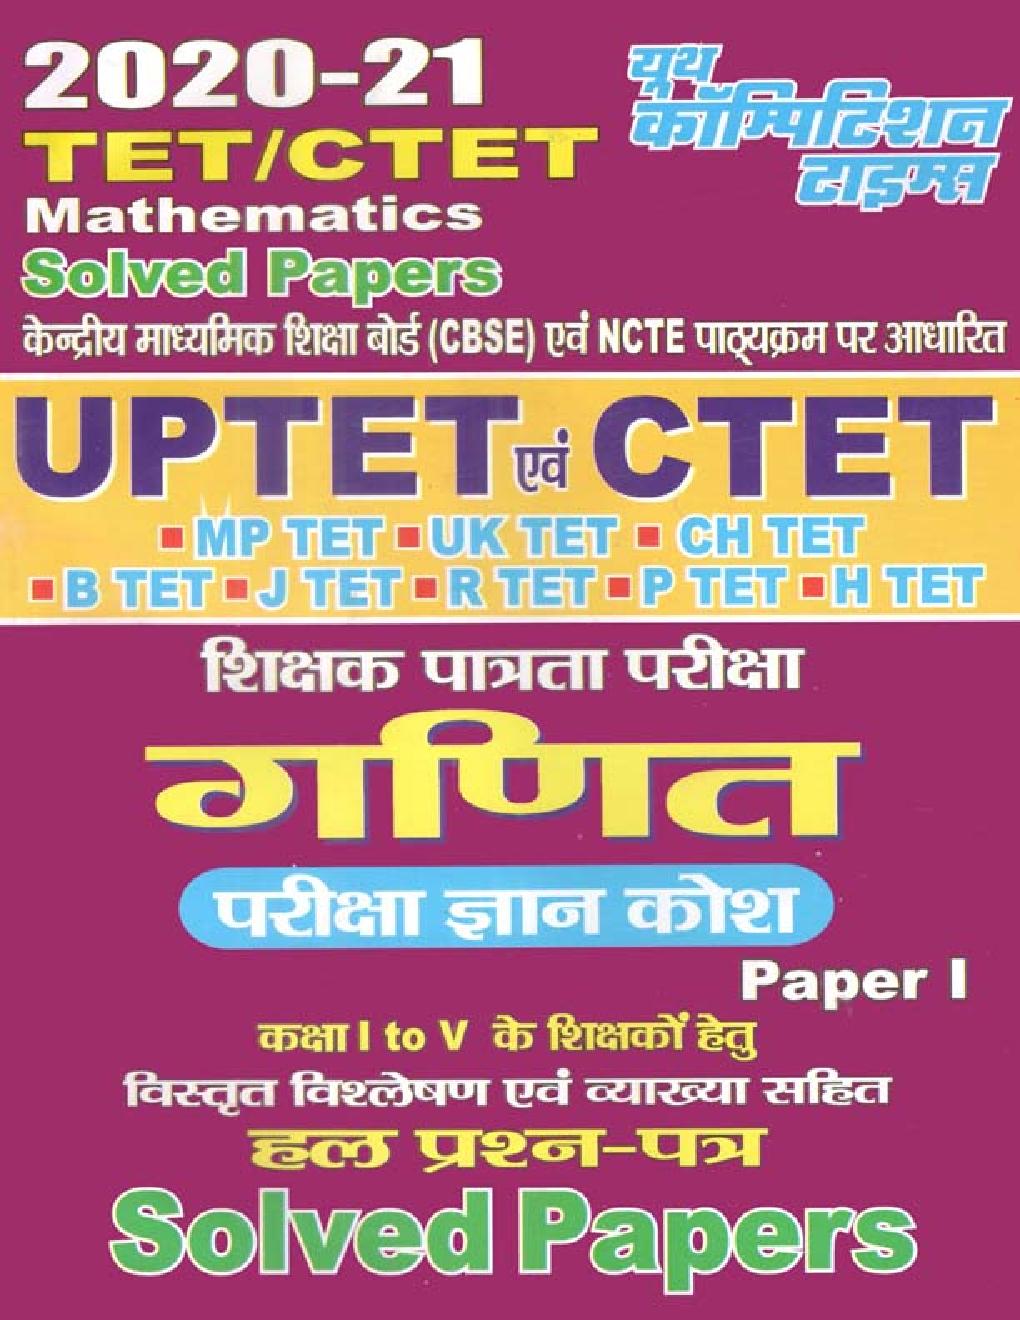 UP TET/CTET गणित सॉल्व्ड पेपर्स परीक्षा ज्ञान कोष Paper-I (2020-21) - Page 1